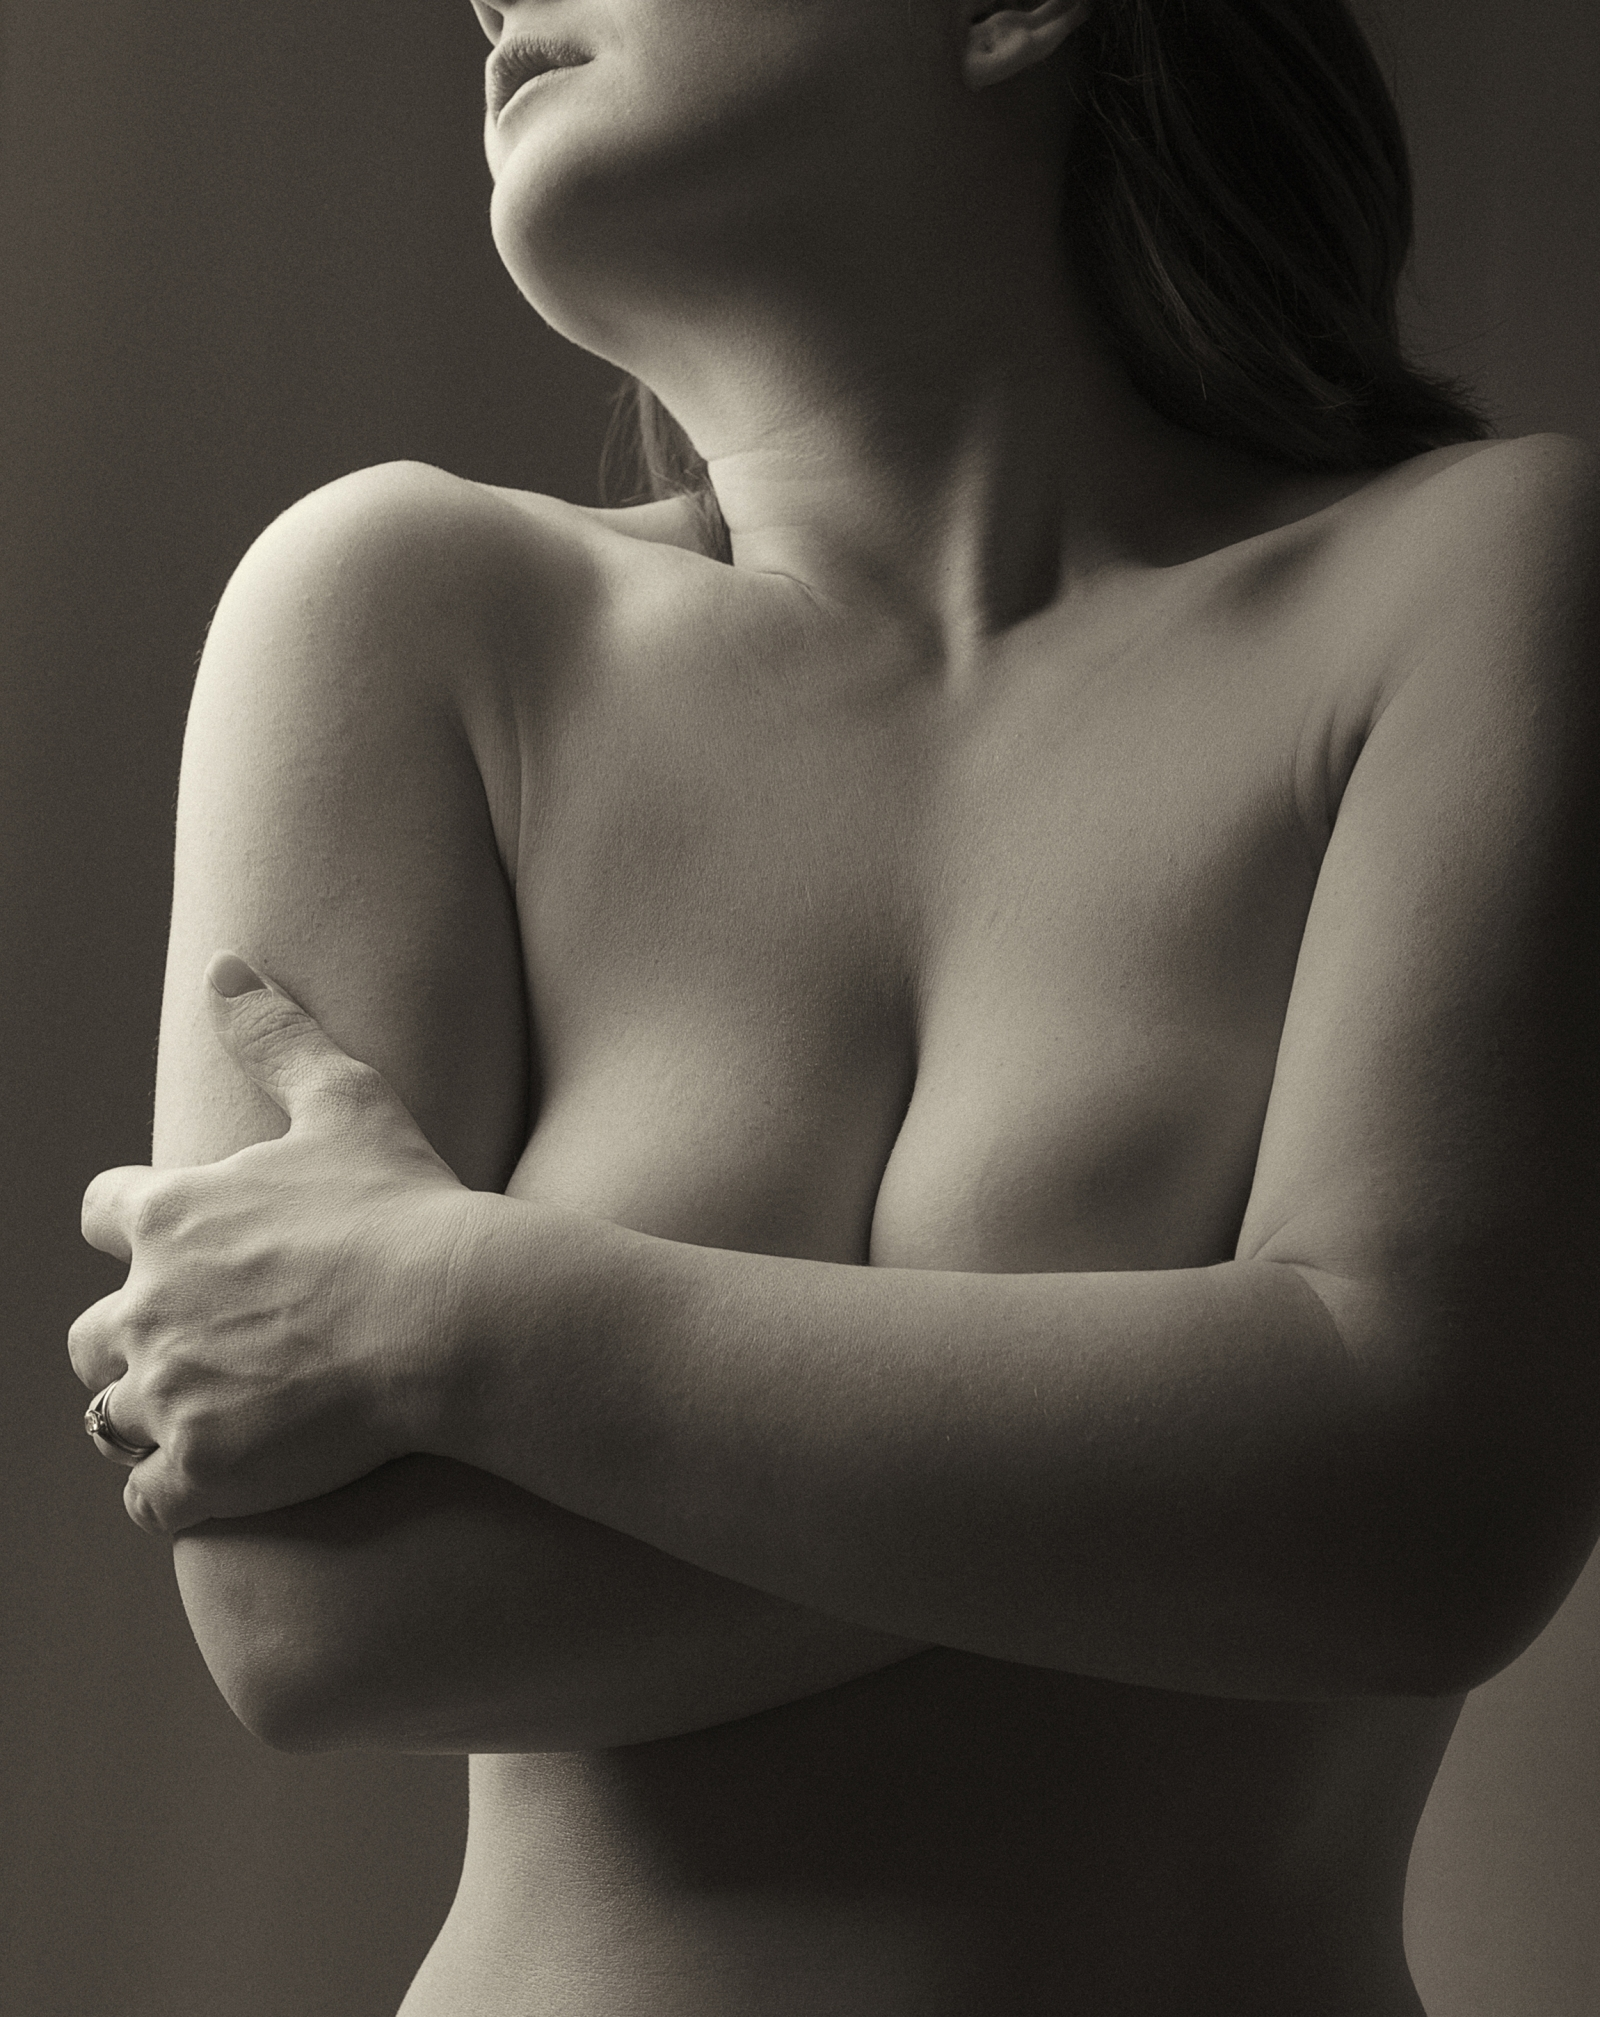 Fine art portrait of a female hugging herself